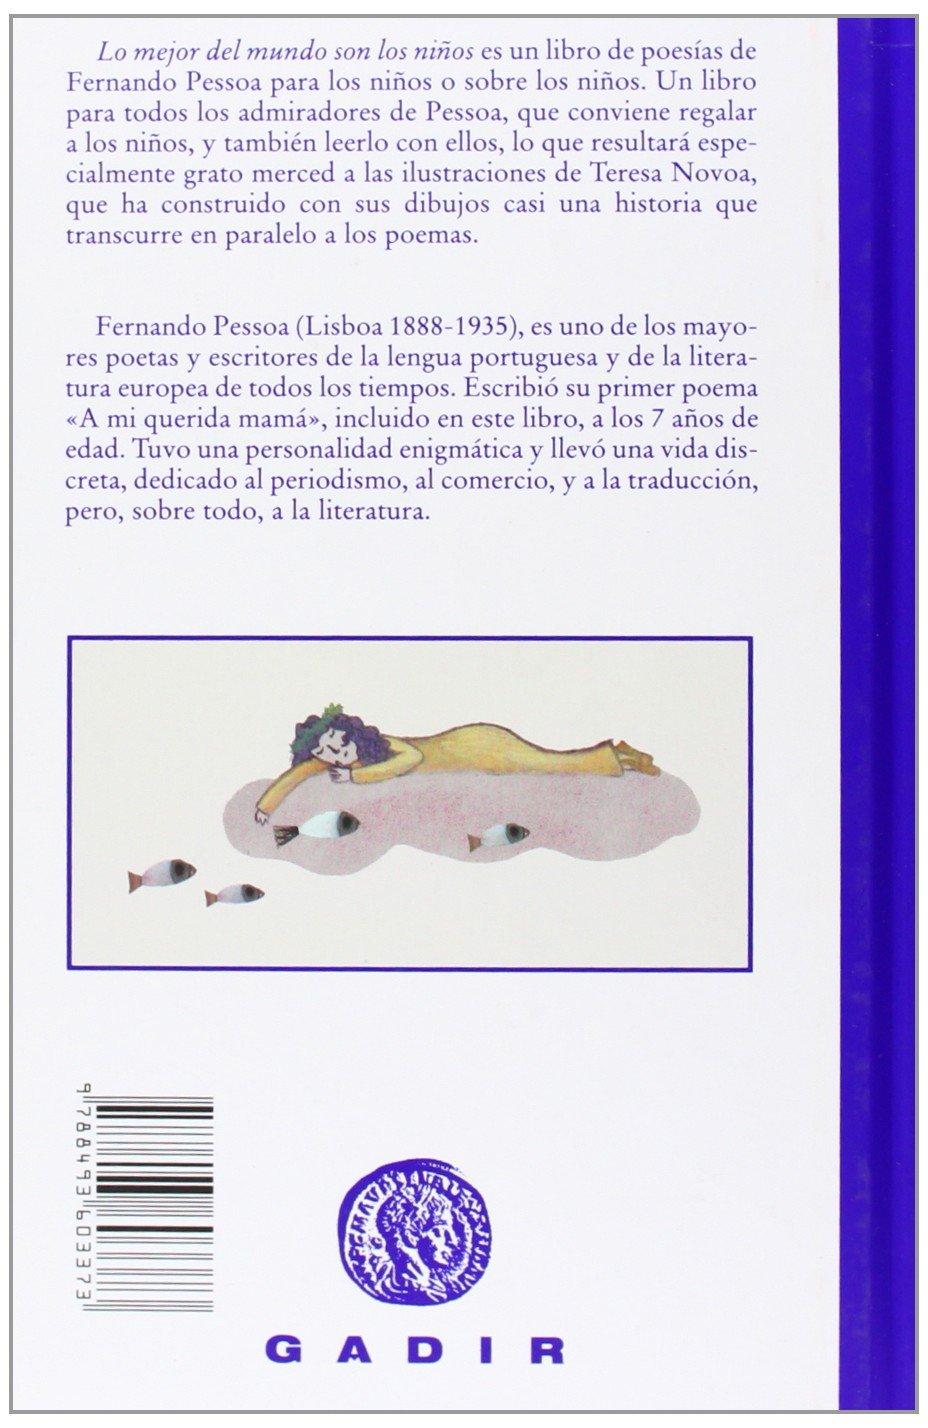 lo mejor del mundo son los ninos spanish edition fernando pessoa amazoncom books